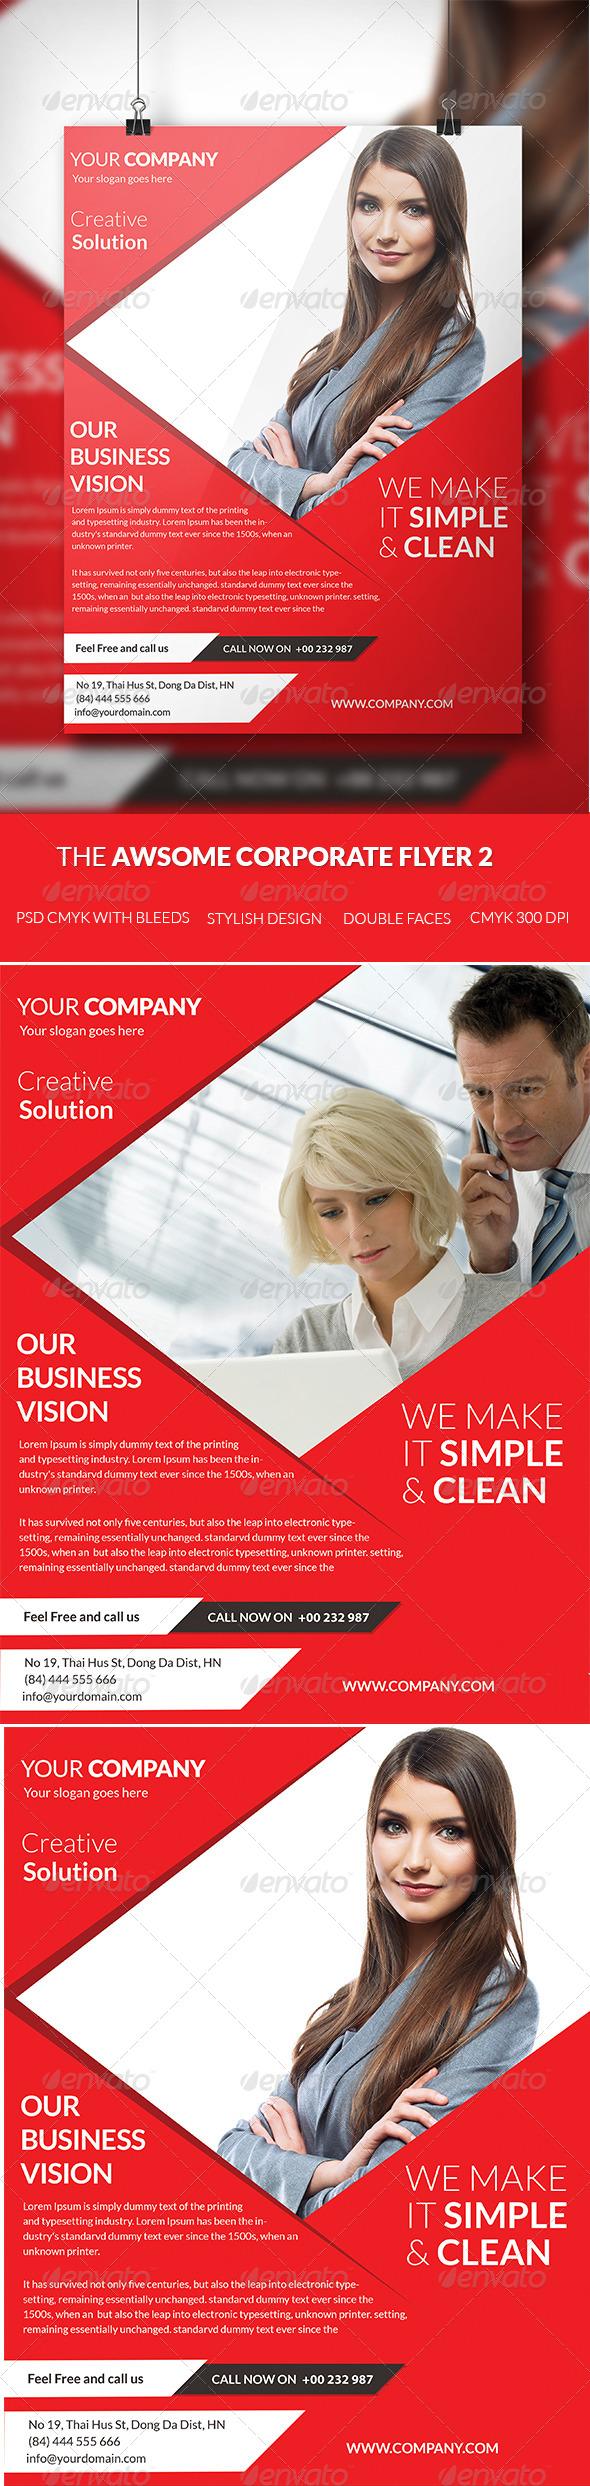 GraphicRiver The Awsome Corporate Flyer Template 2 7502783